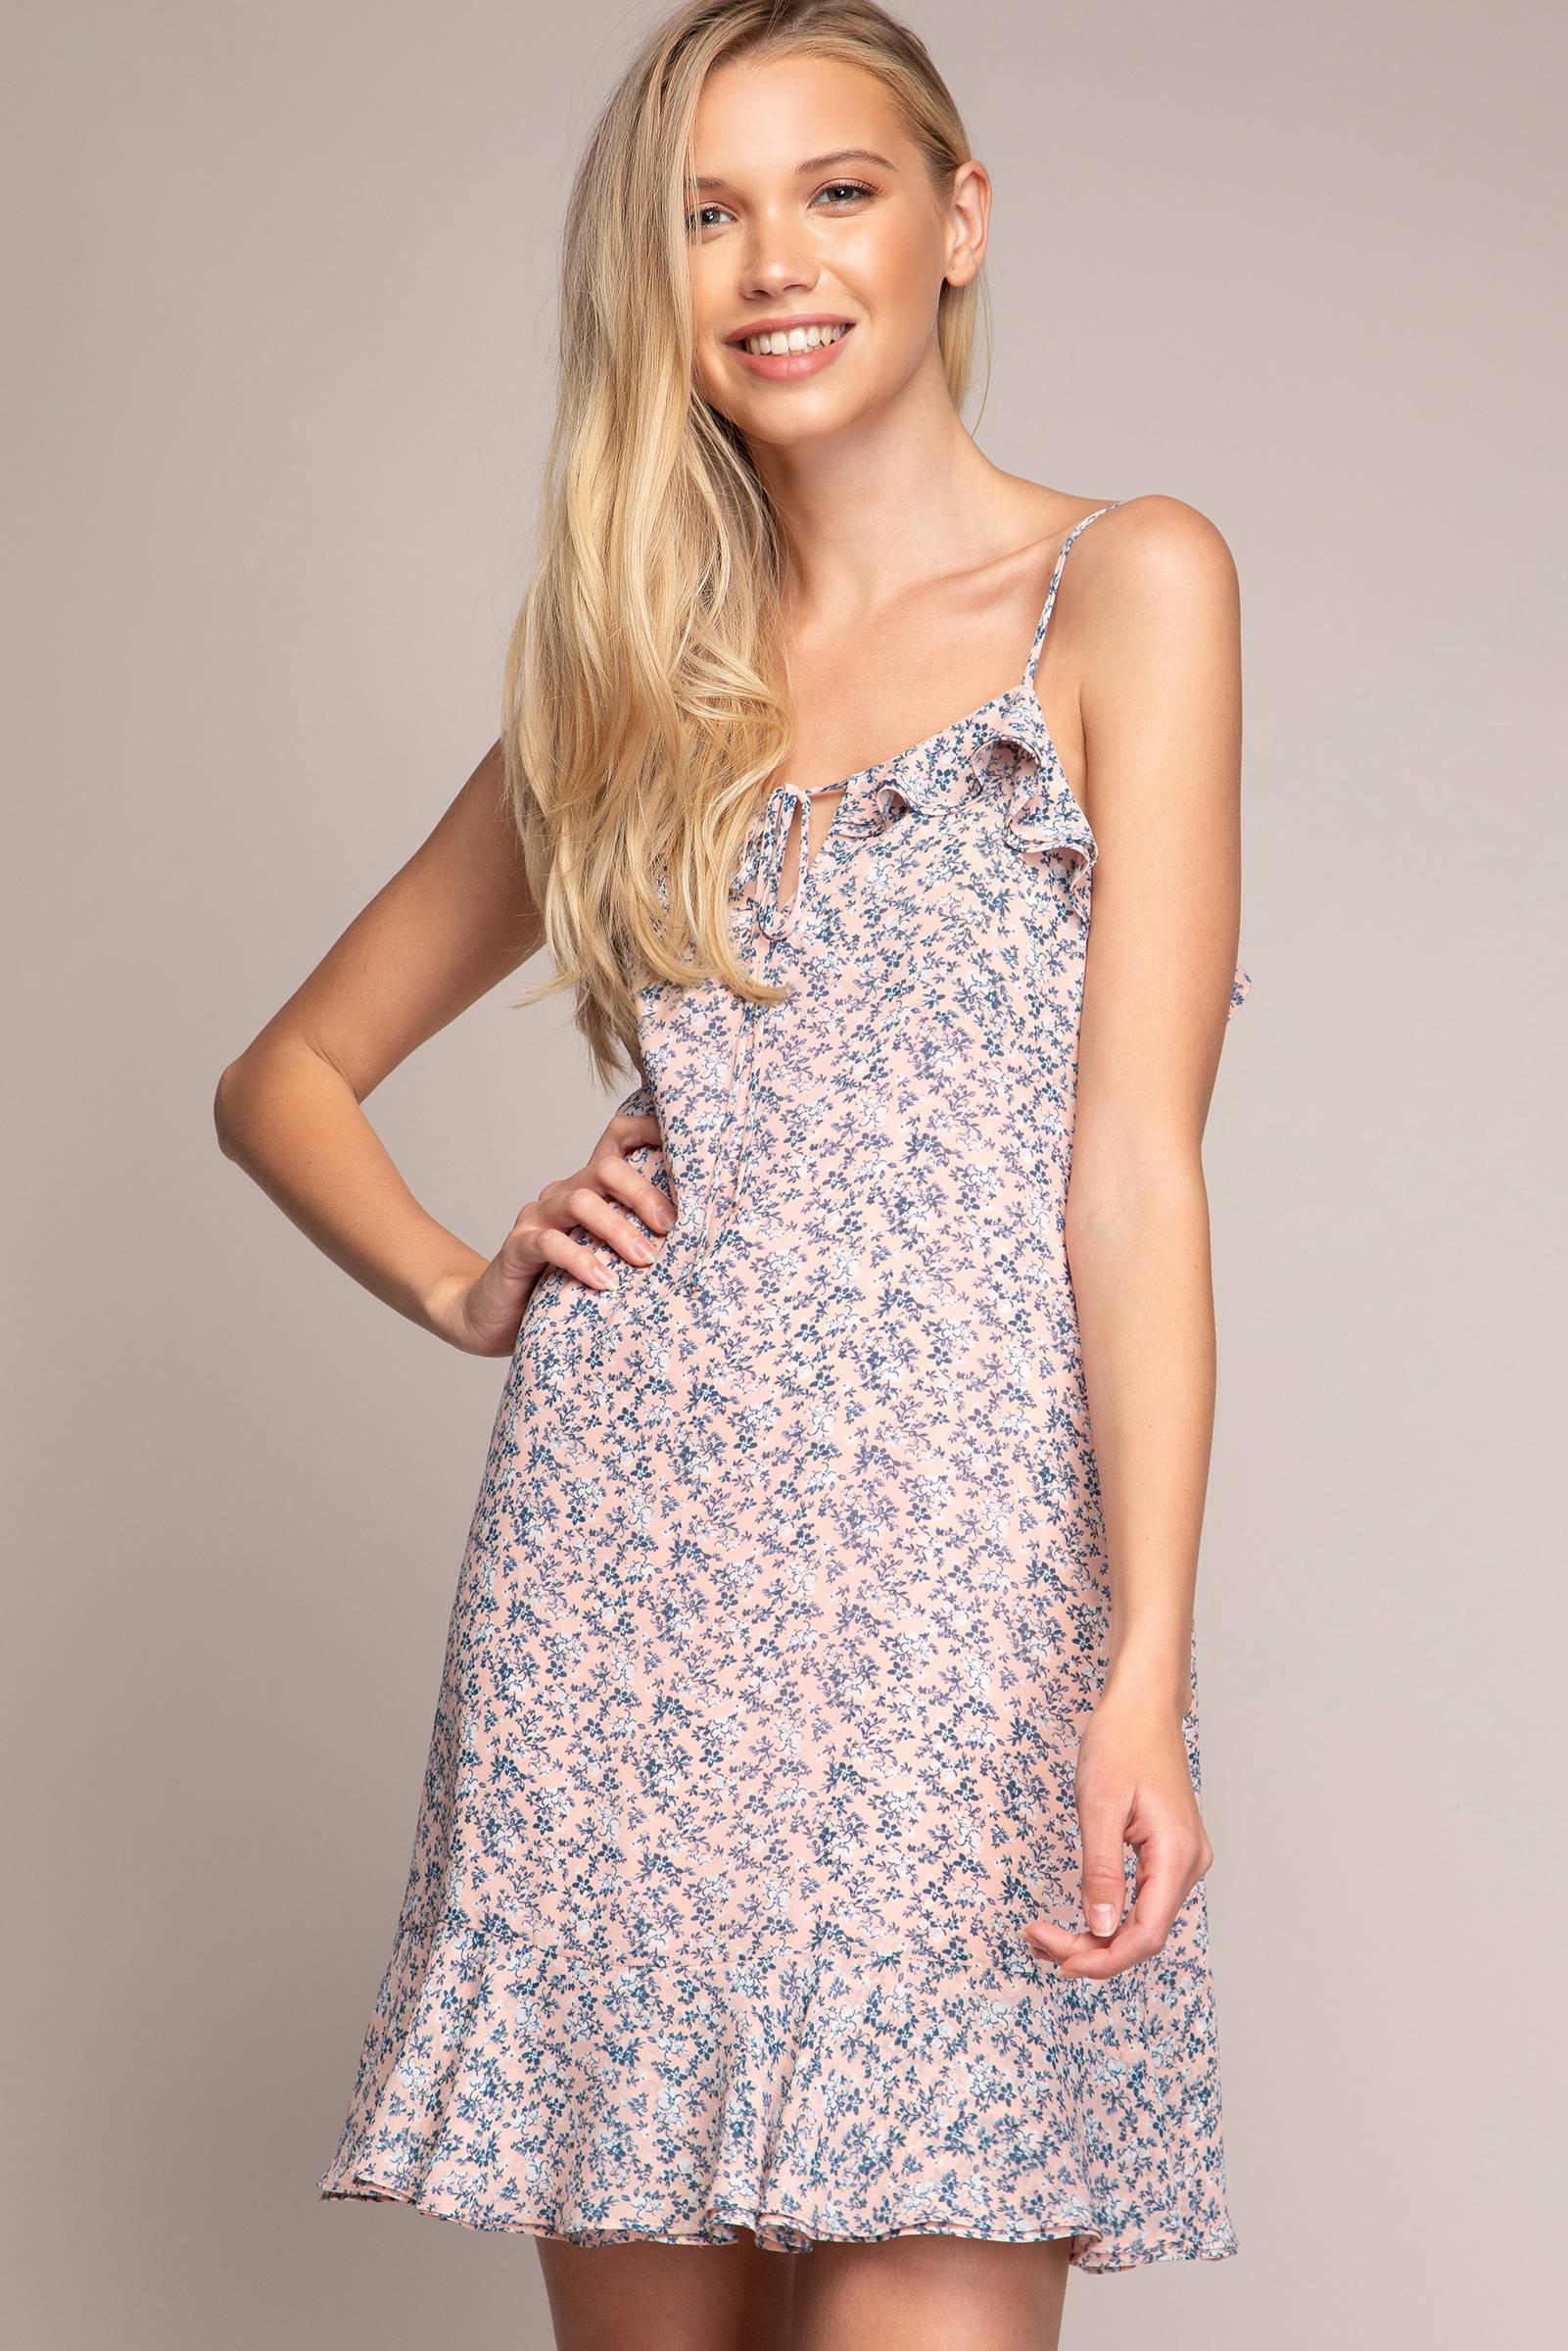 Model in Brielle Floral Dress